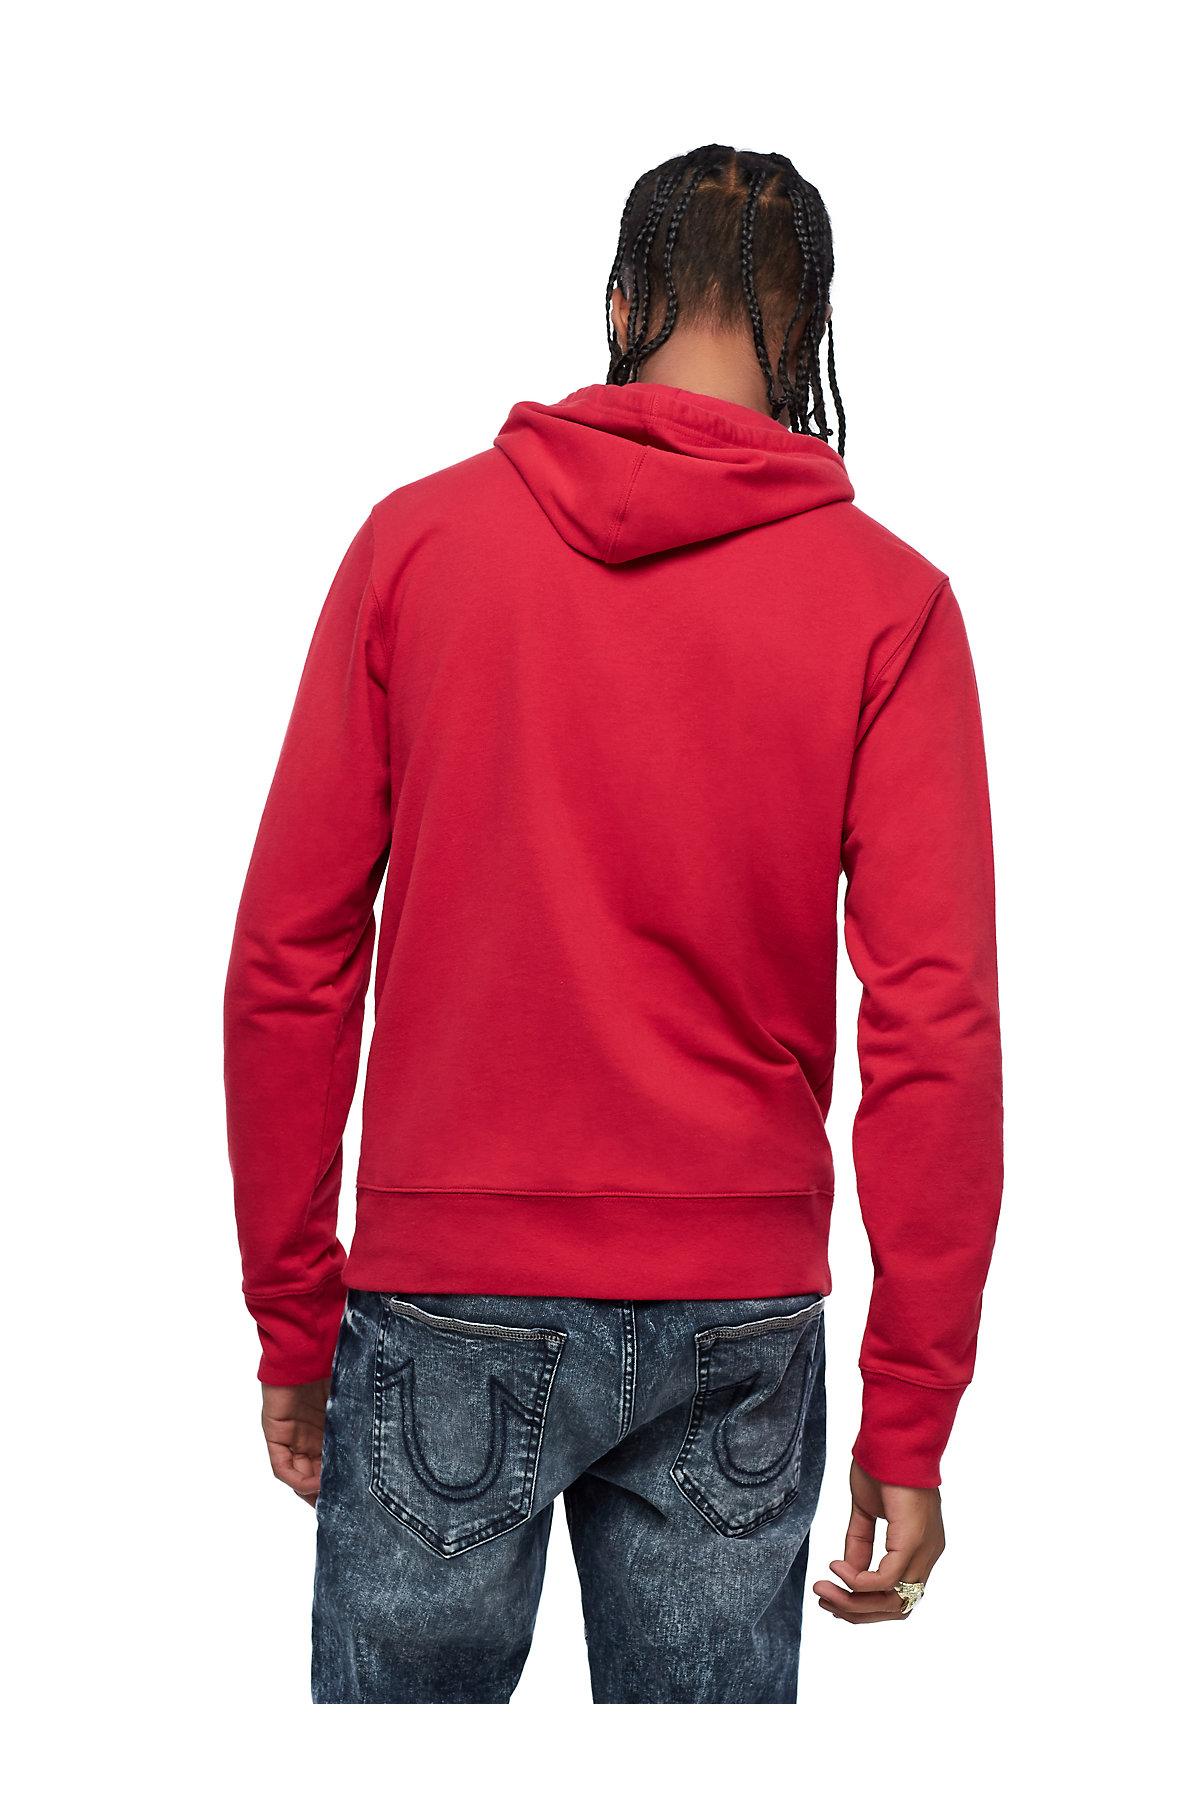 True-Religion-Men-039-s-Mirror-Logo-Reflection-Pullover-Hoodie-Sweatshirt thumbnail 4